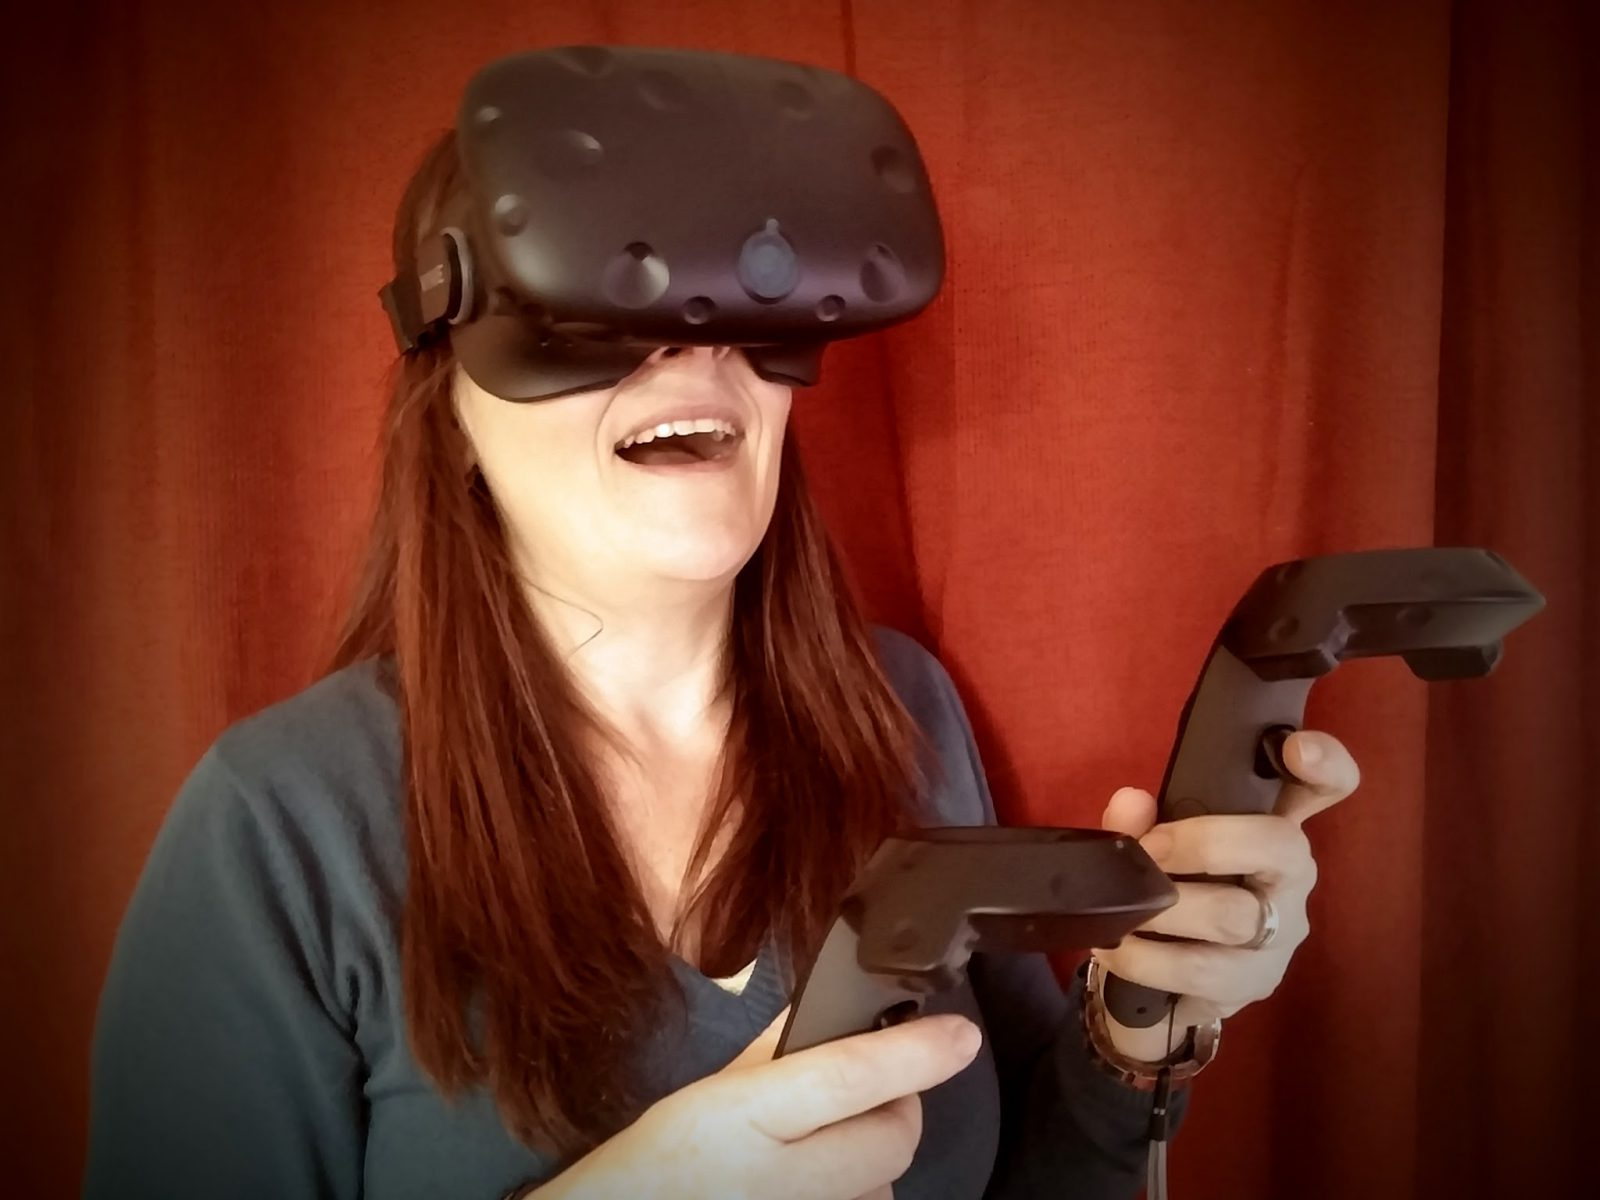 Nerdweib: Unboxing HTC Vive VR-Brille Susanne Angeli